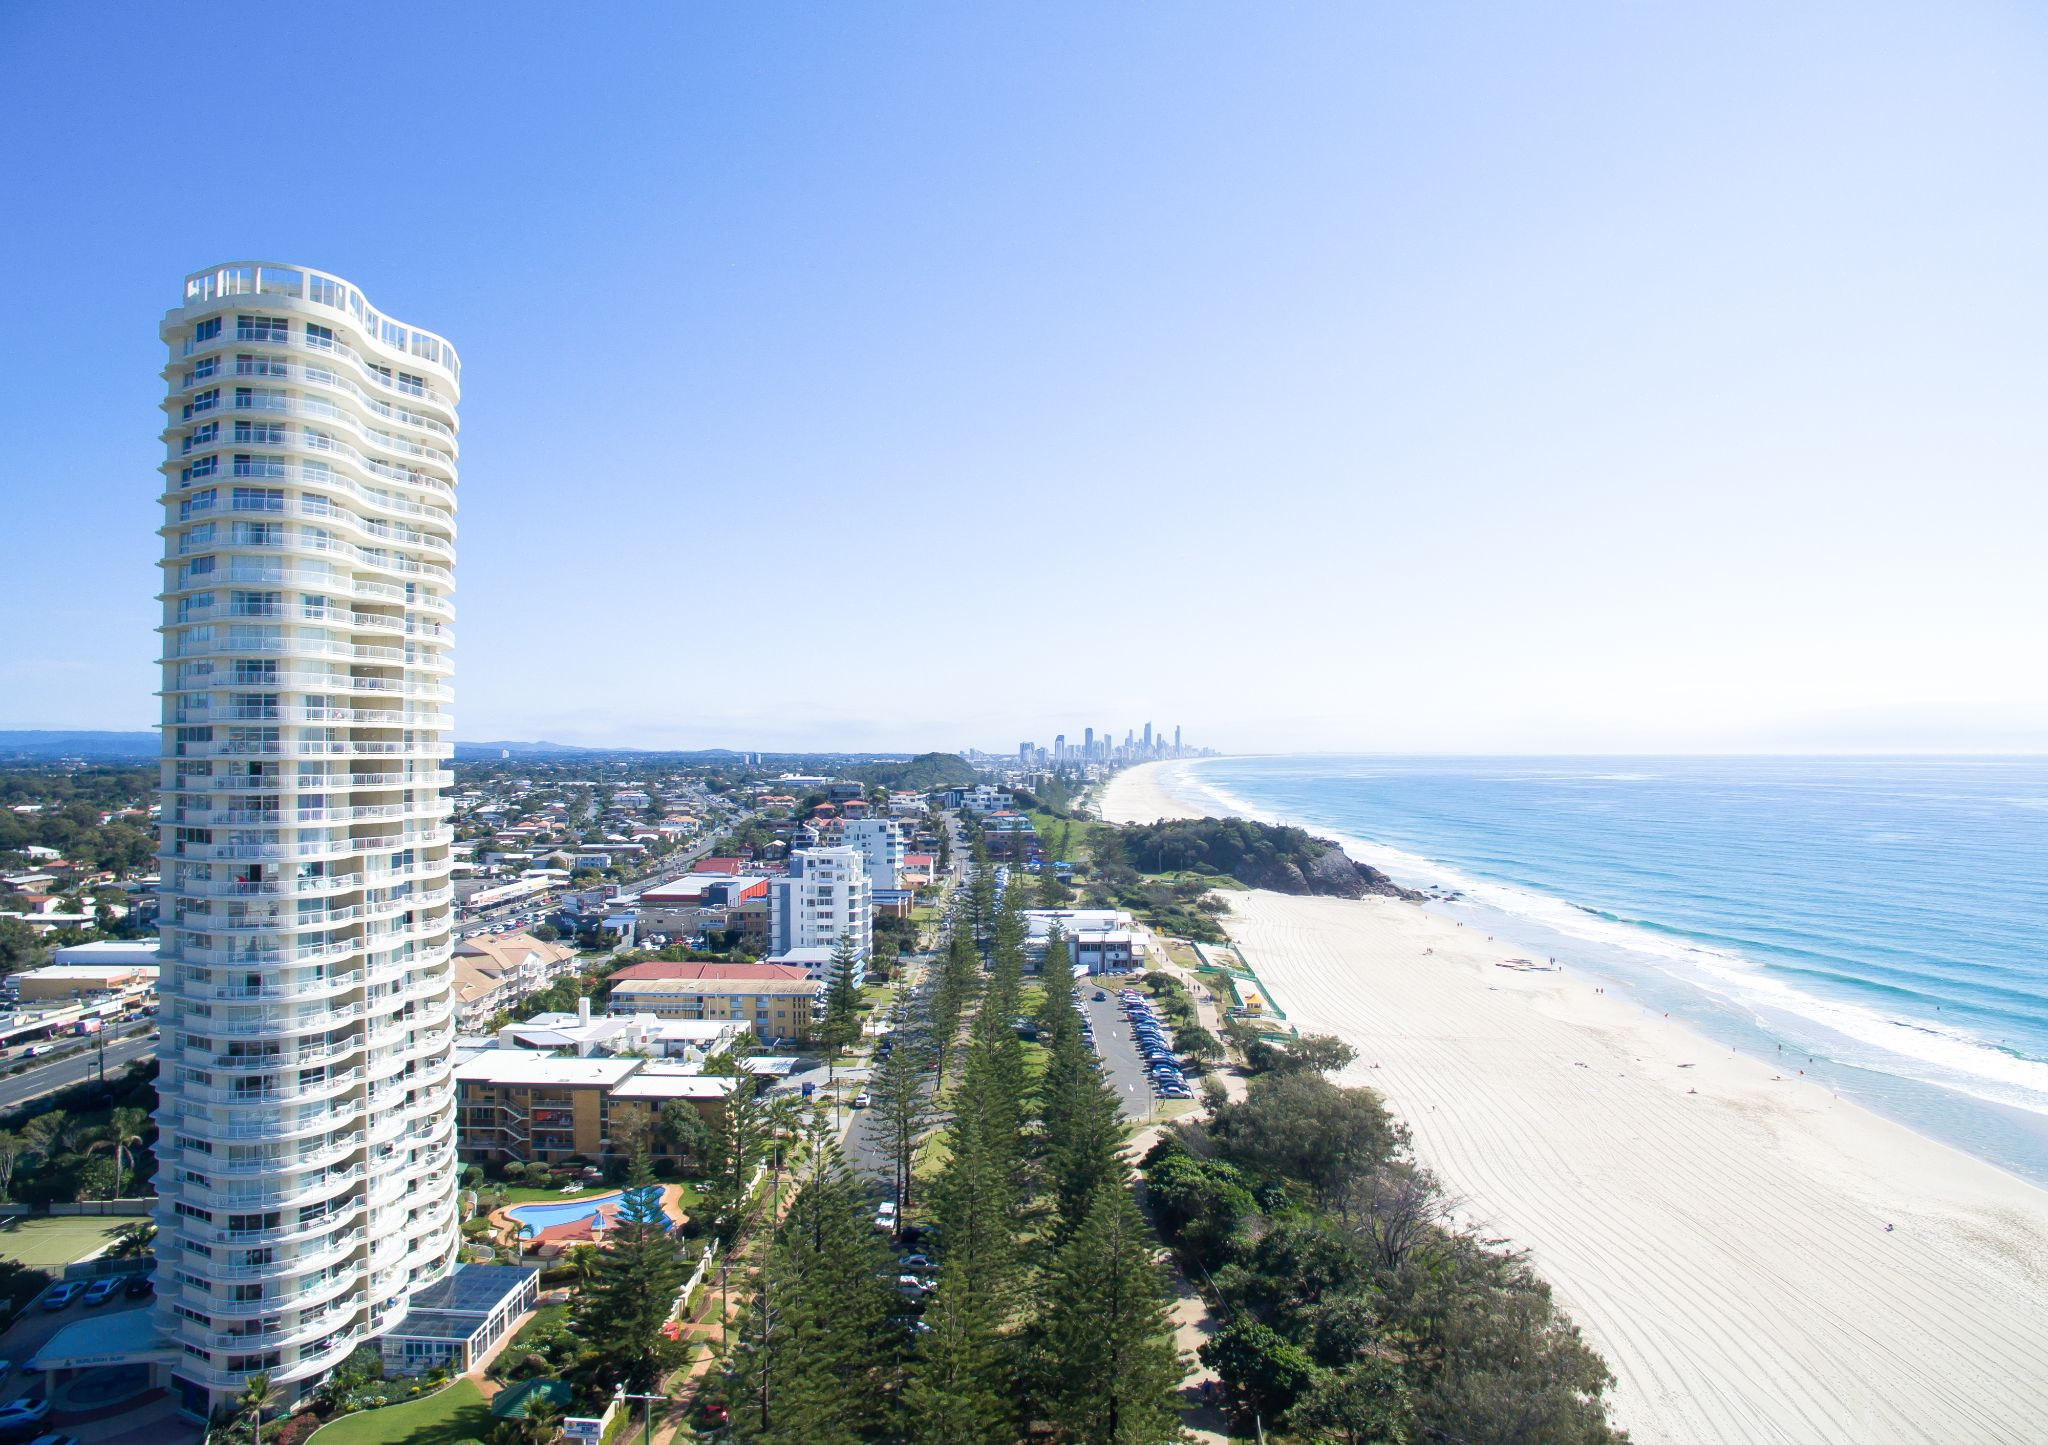 2nd Avenue Beachside Apartments facilities